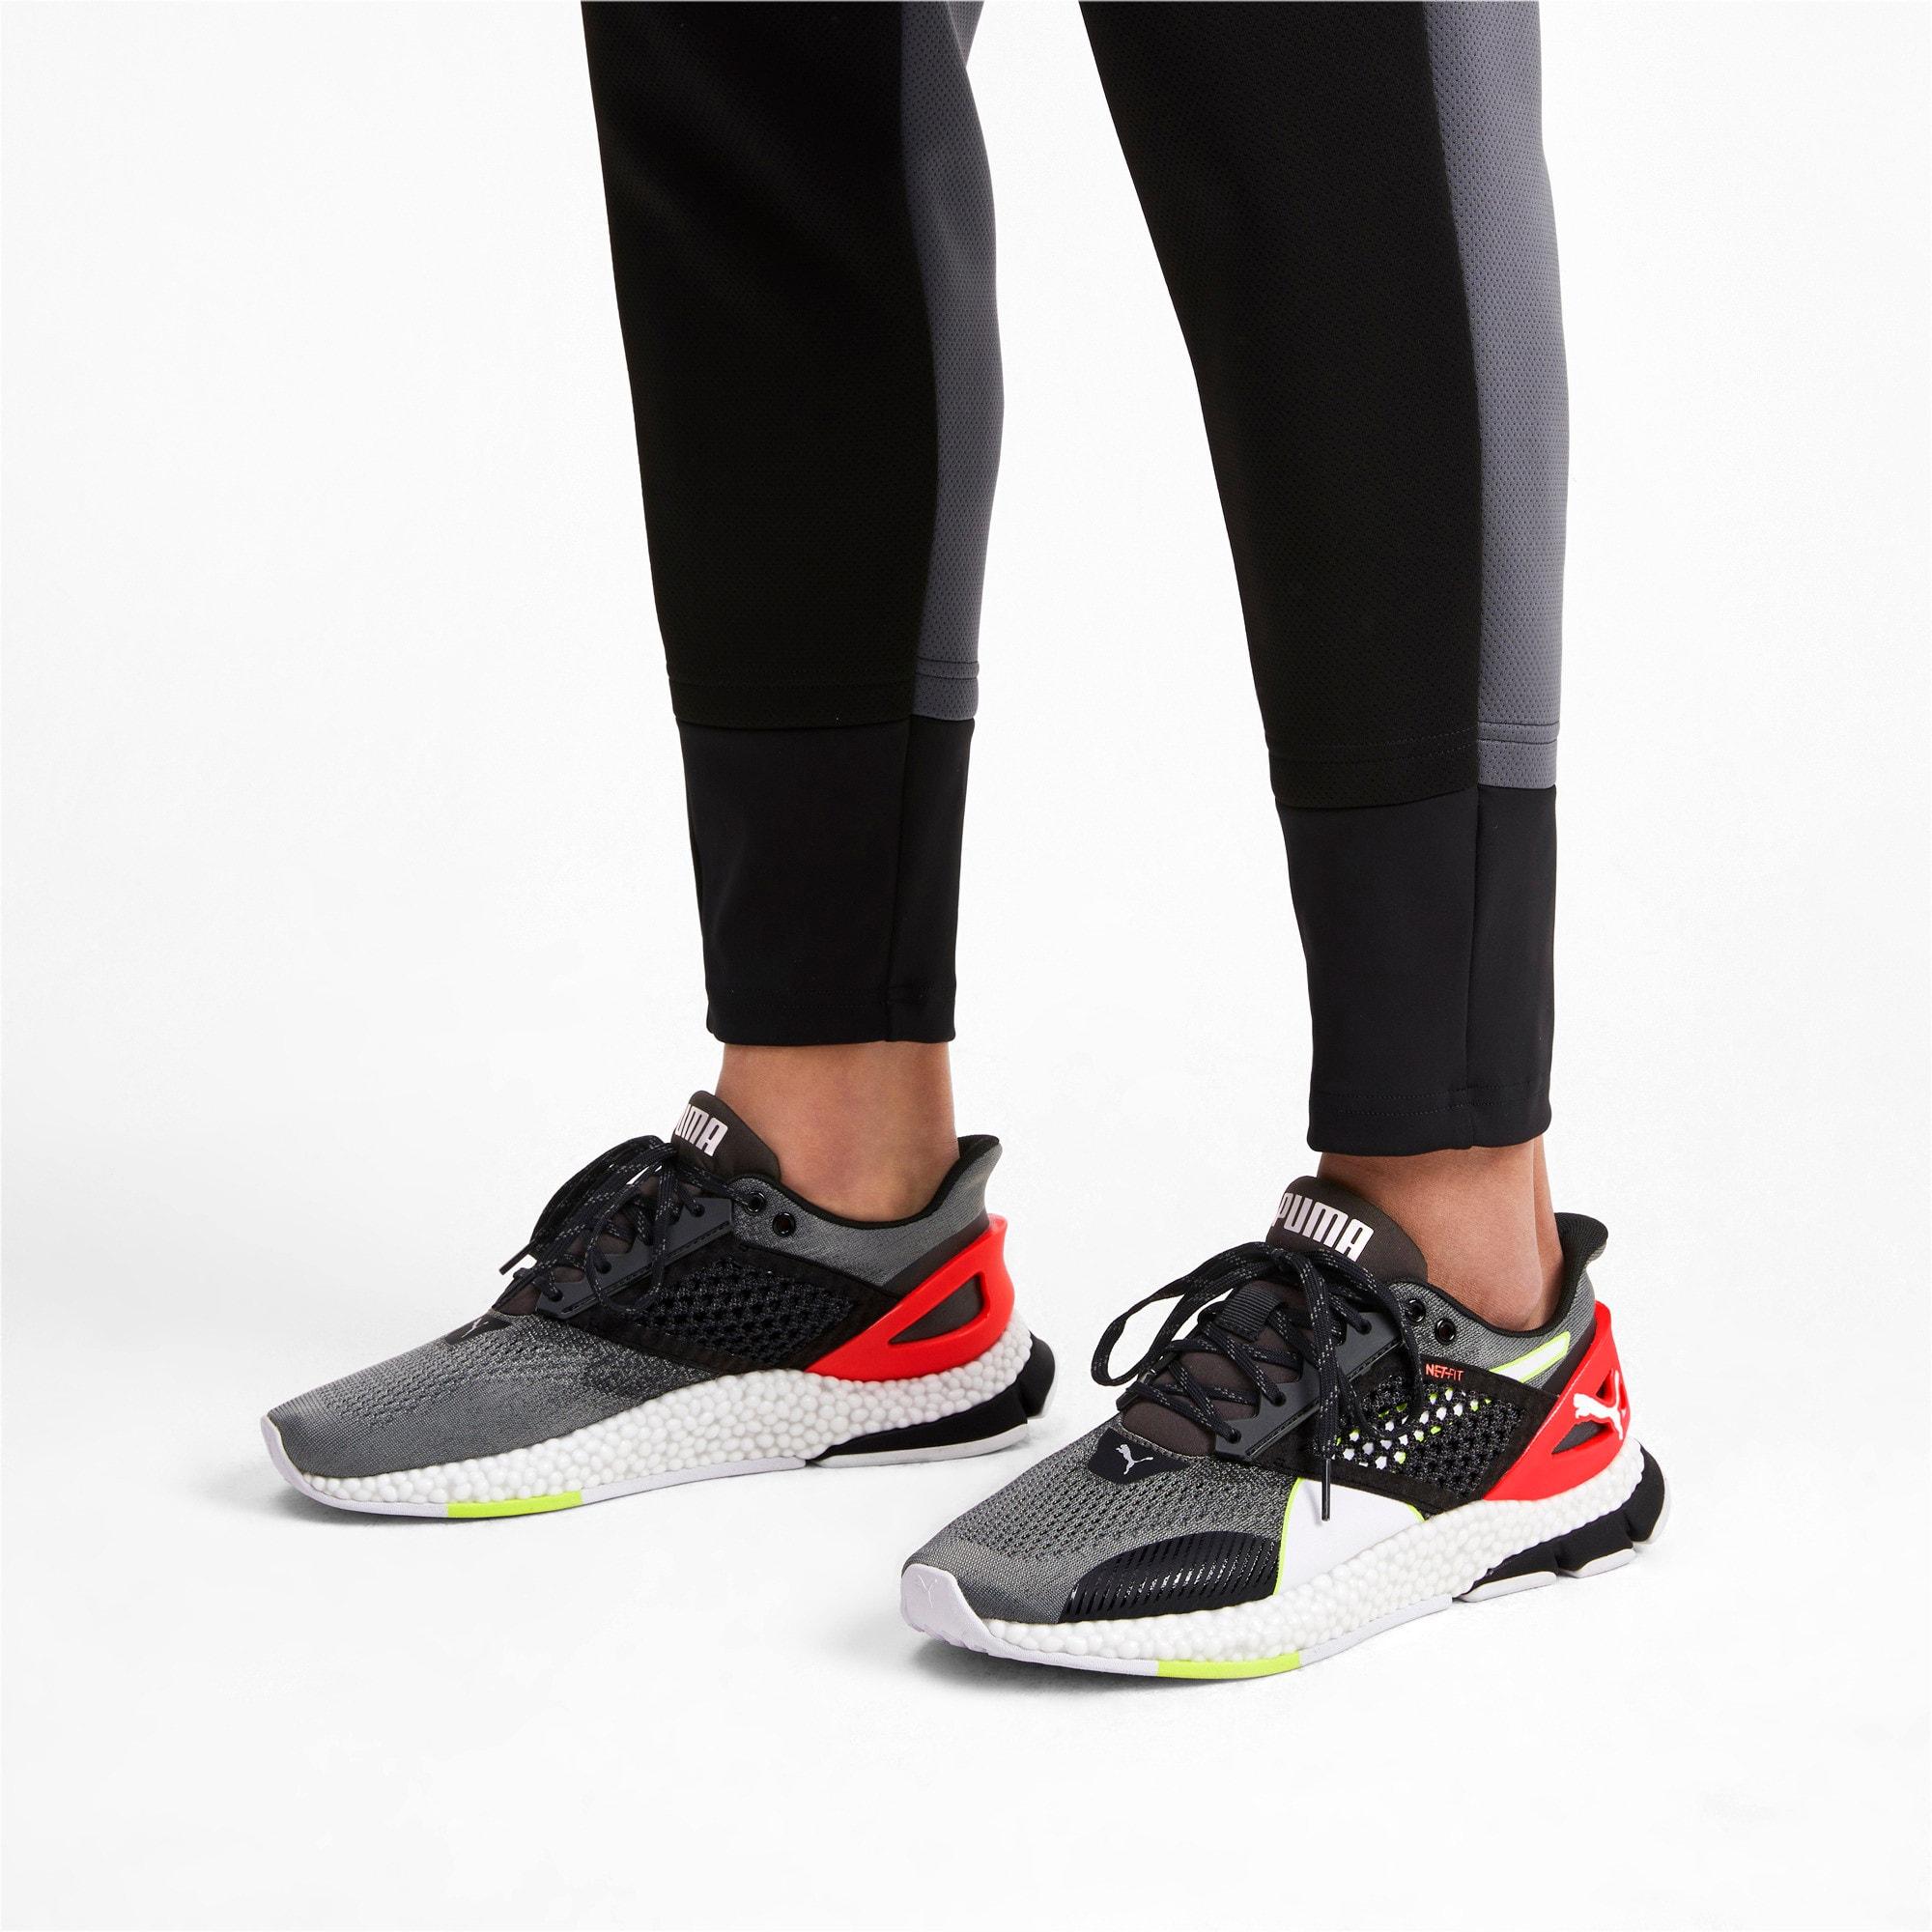 Thumbnail 3 of HYBRID NETFIT Astro Men's Running Shoes, CASTLEROCK-Puma Blck-Ngy Red, medium-IND